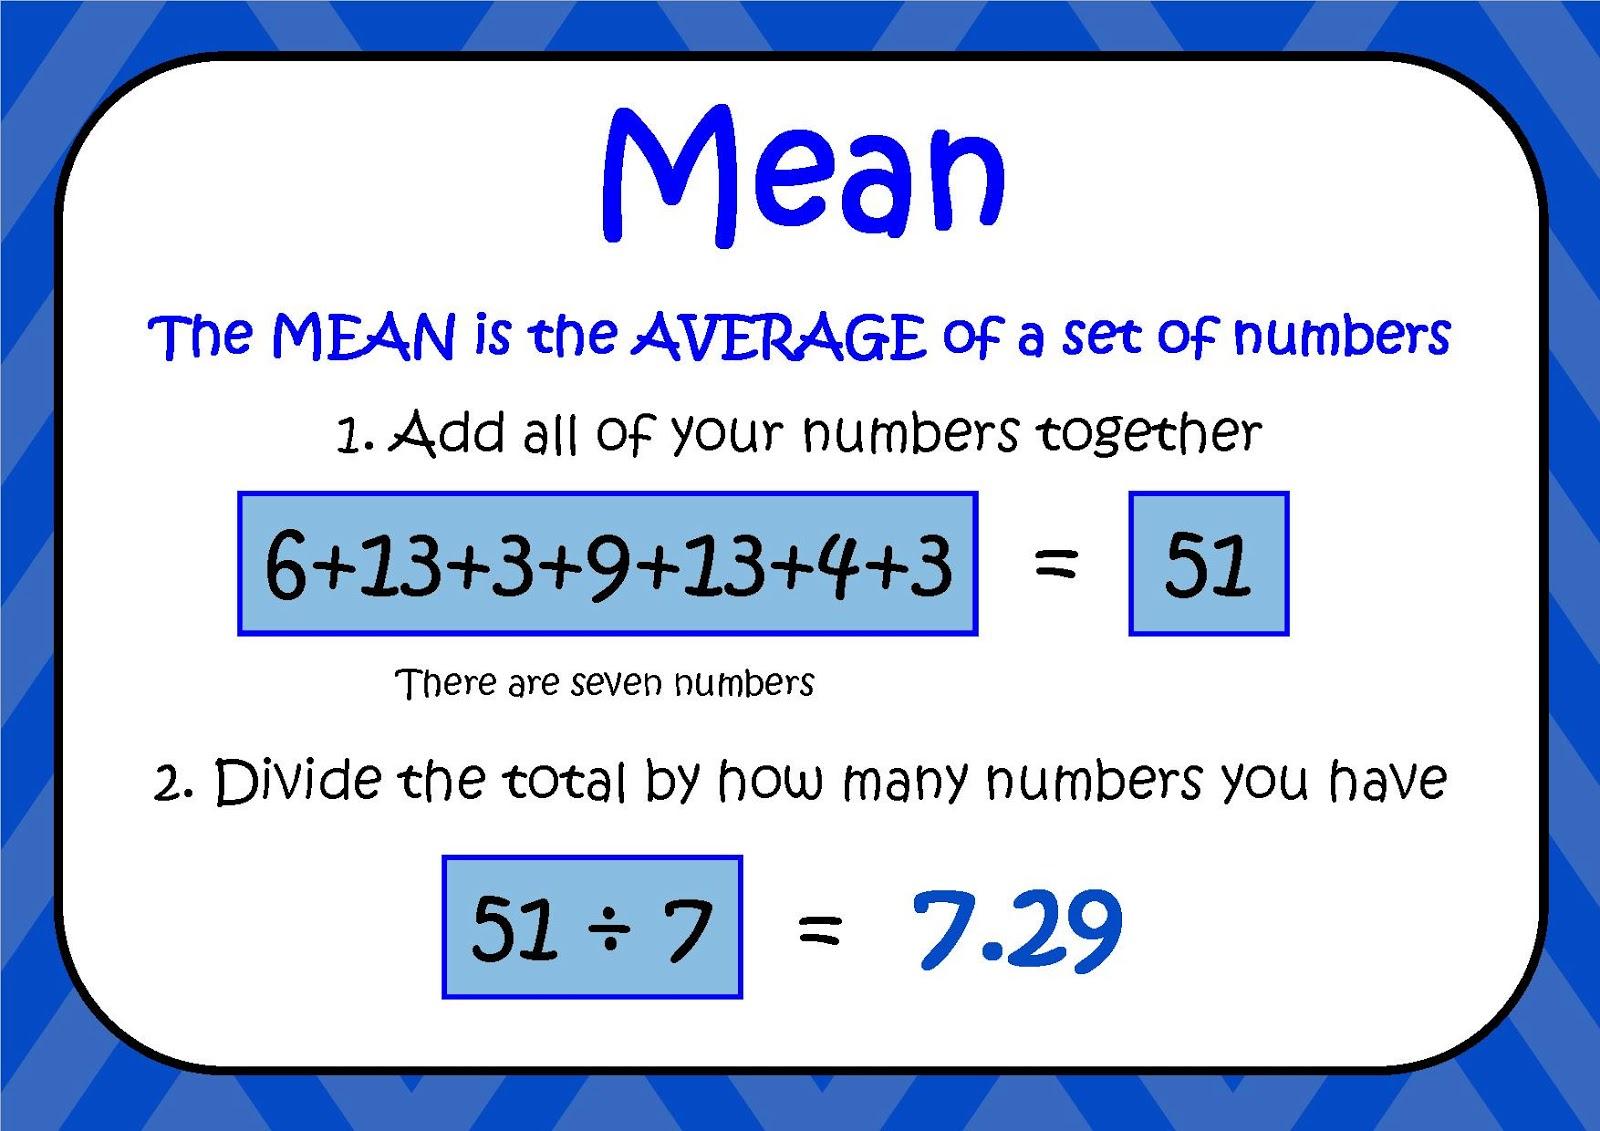 miss allen s 6th grade math mean